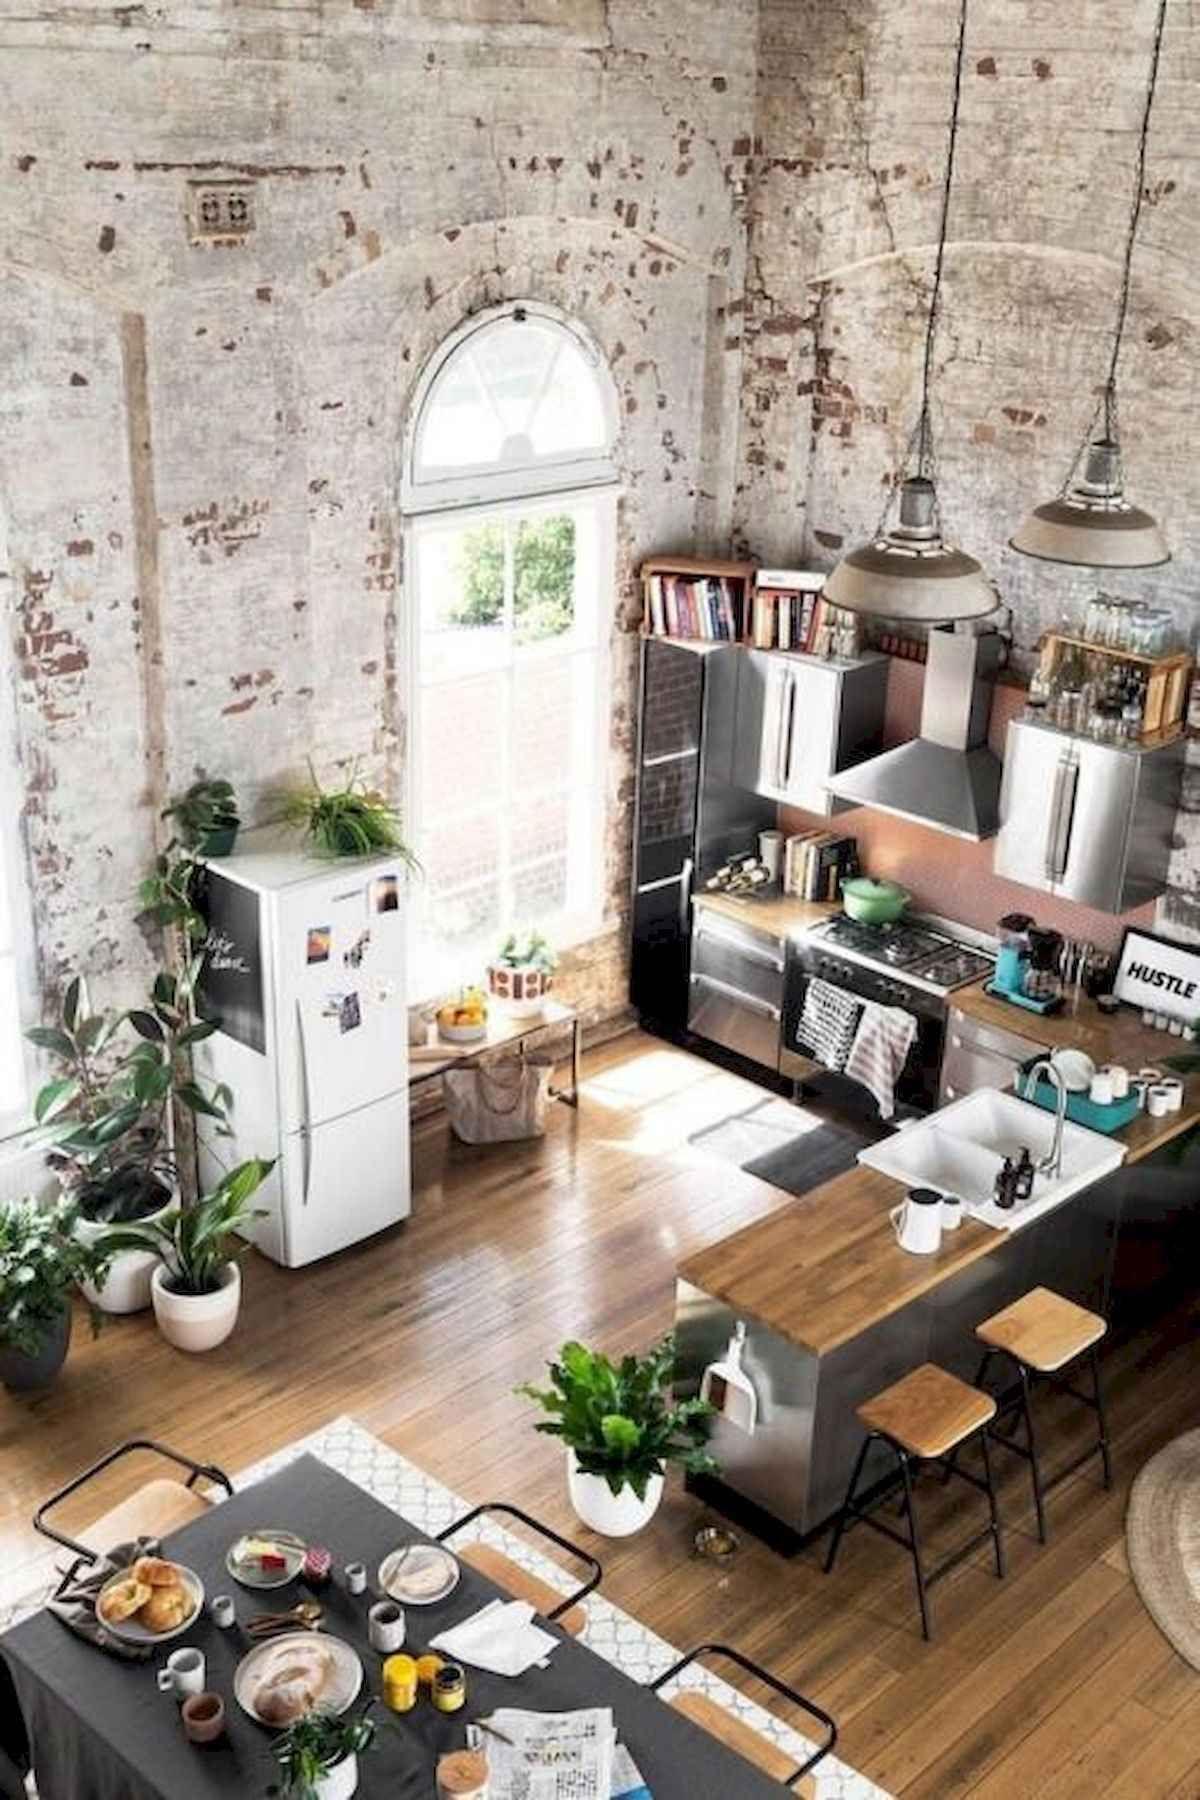 40 Rustic Studio Apartment Decor Ideas 25 Coachdecor Com Industrial Style Kitchen Apartment Decorating Rental Home Interior Design